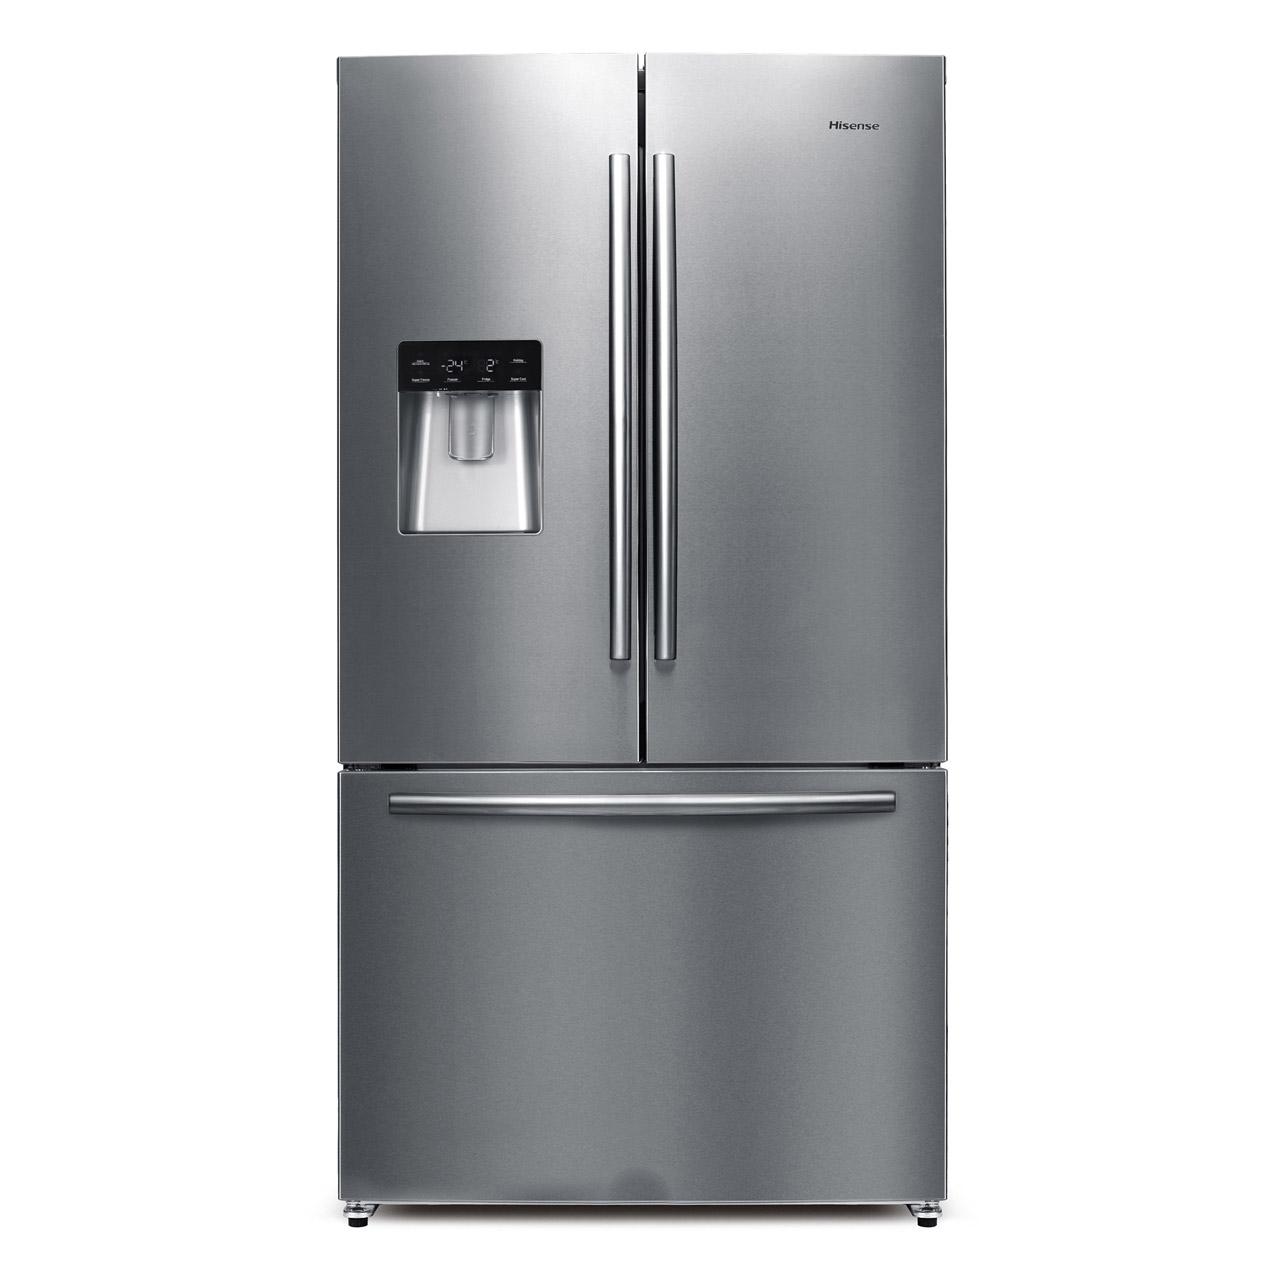 Hisense Rf697n4zs1 American Fridge Freezer With French